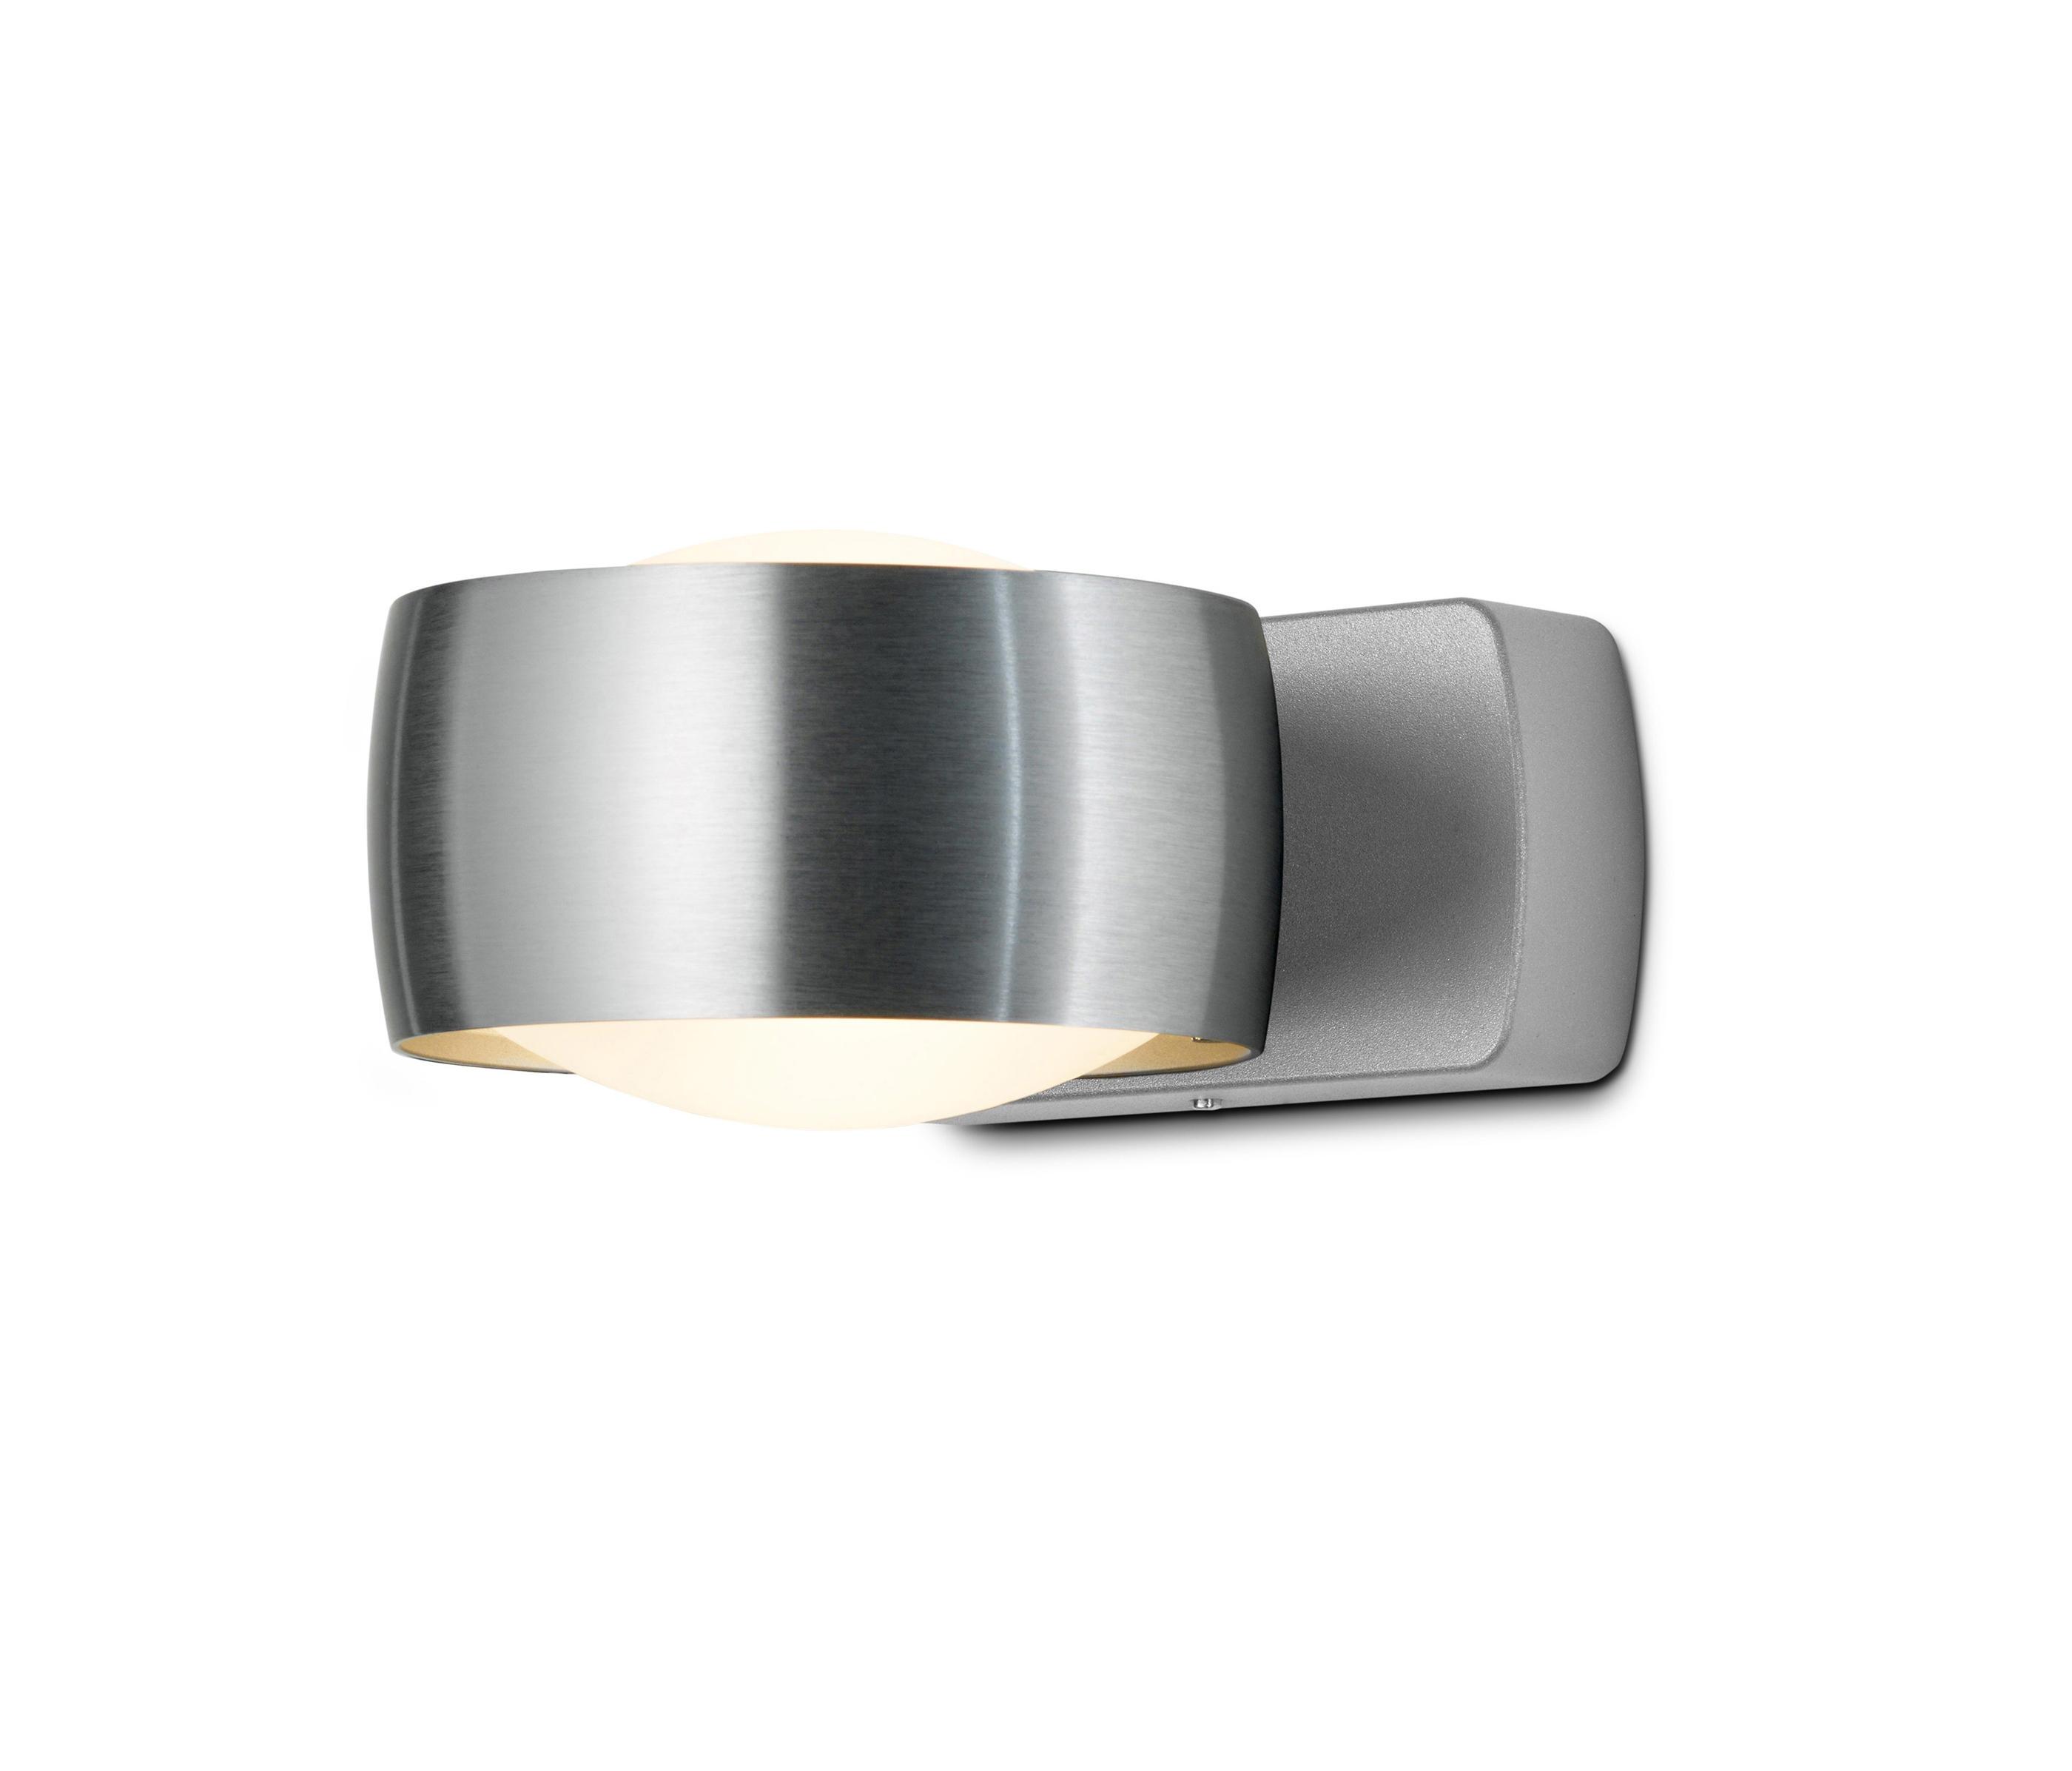 grace wall luminaire general lighting from oligo. Black Bedroom Furniture Sets. Home Design Ideas